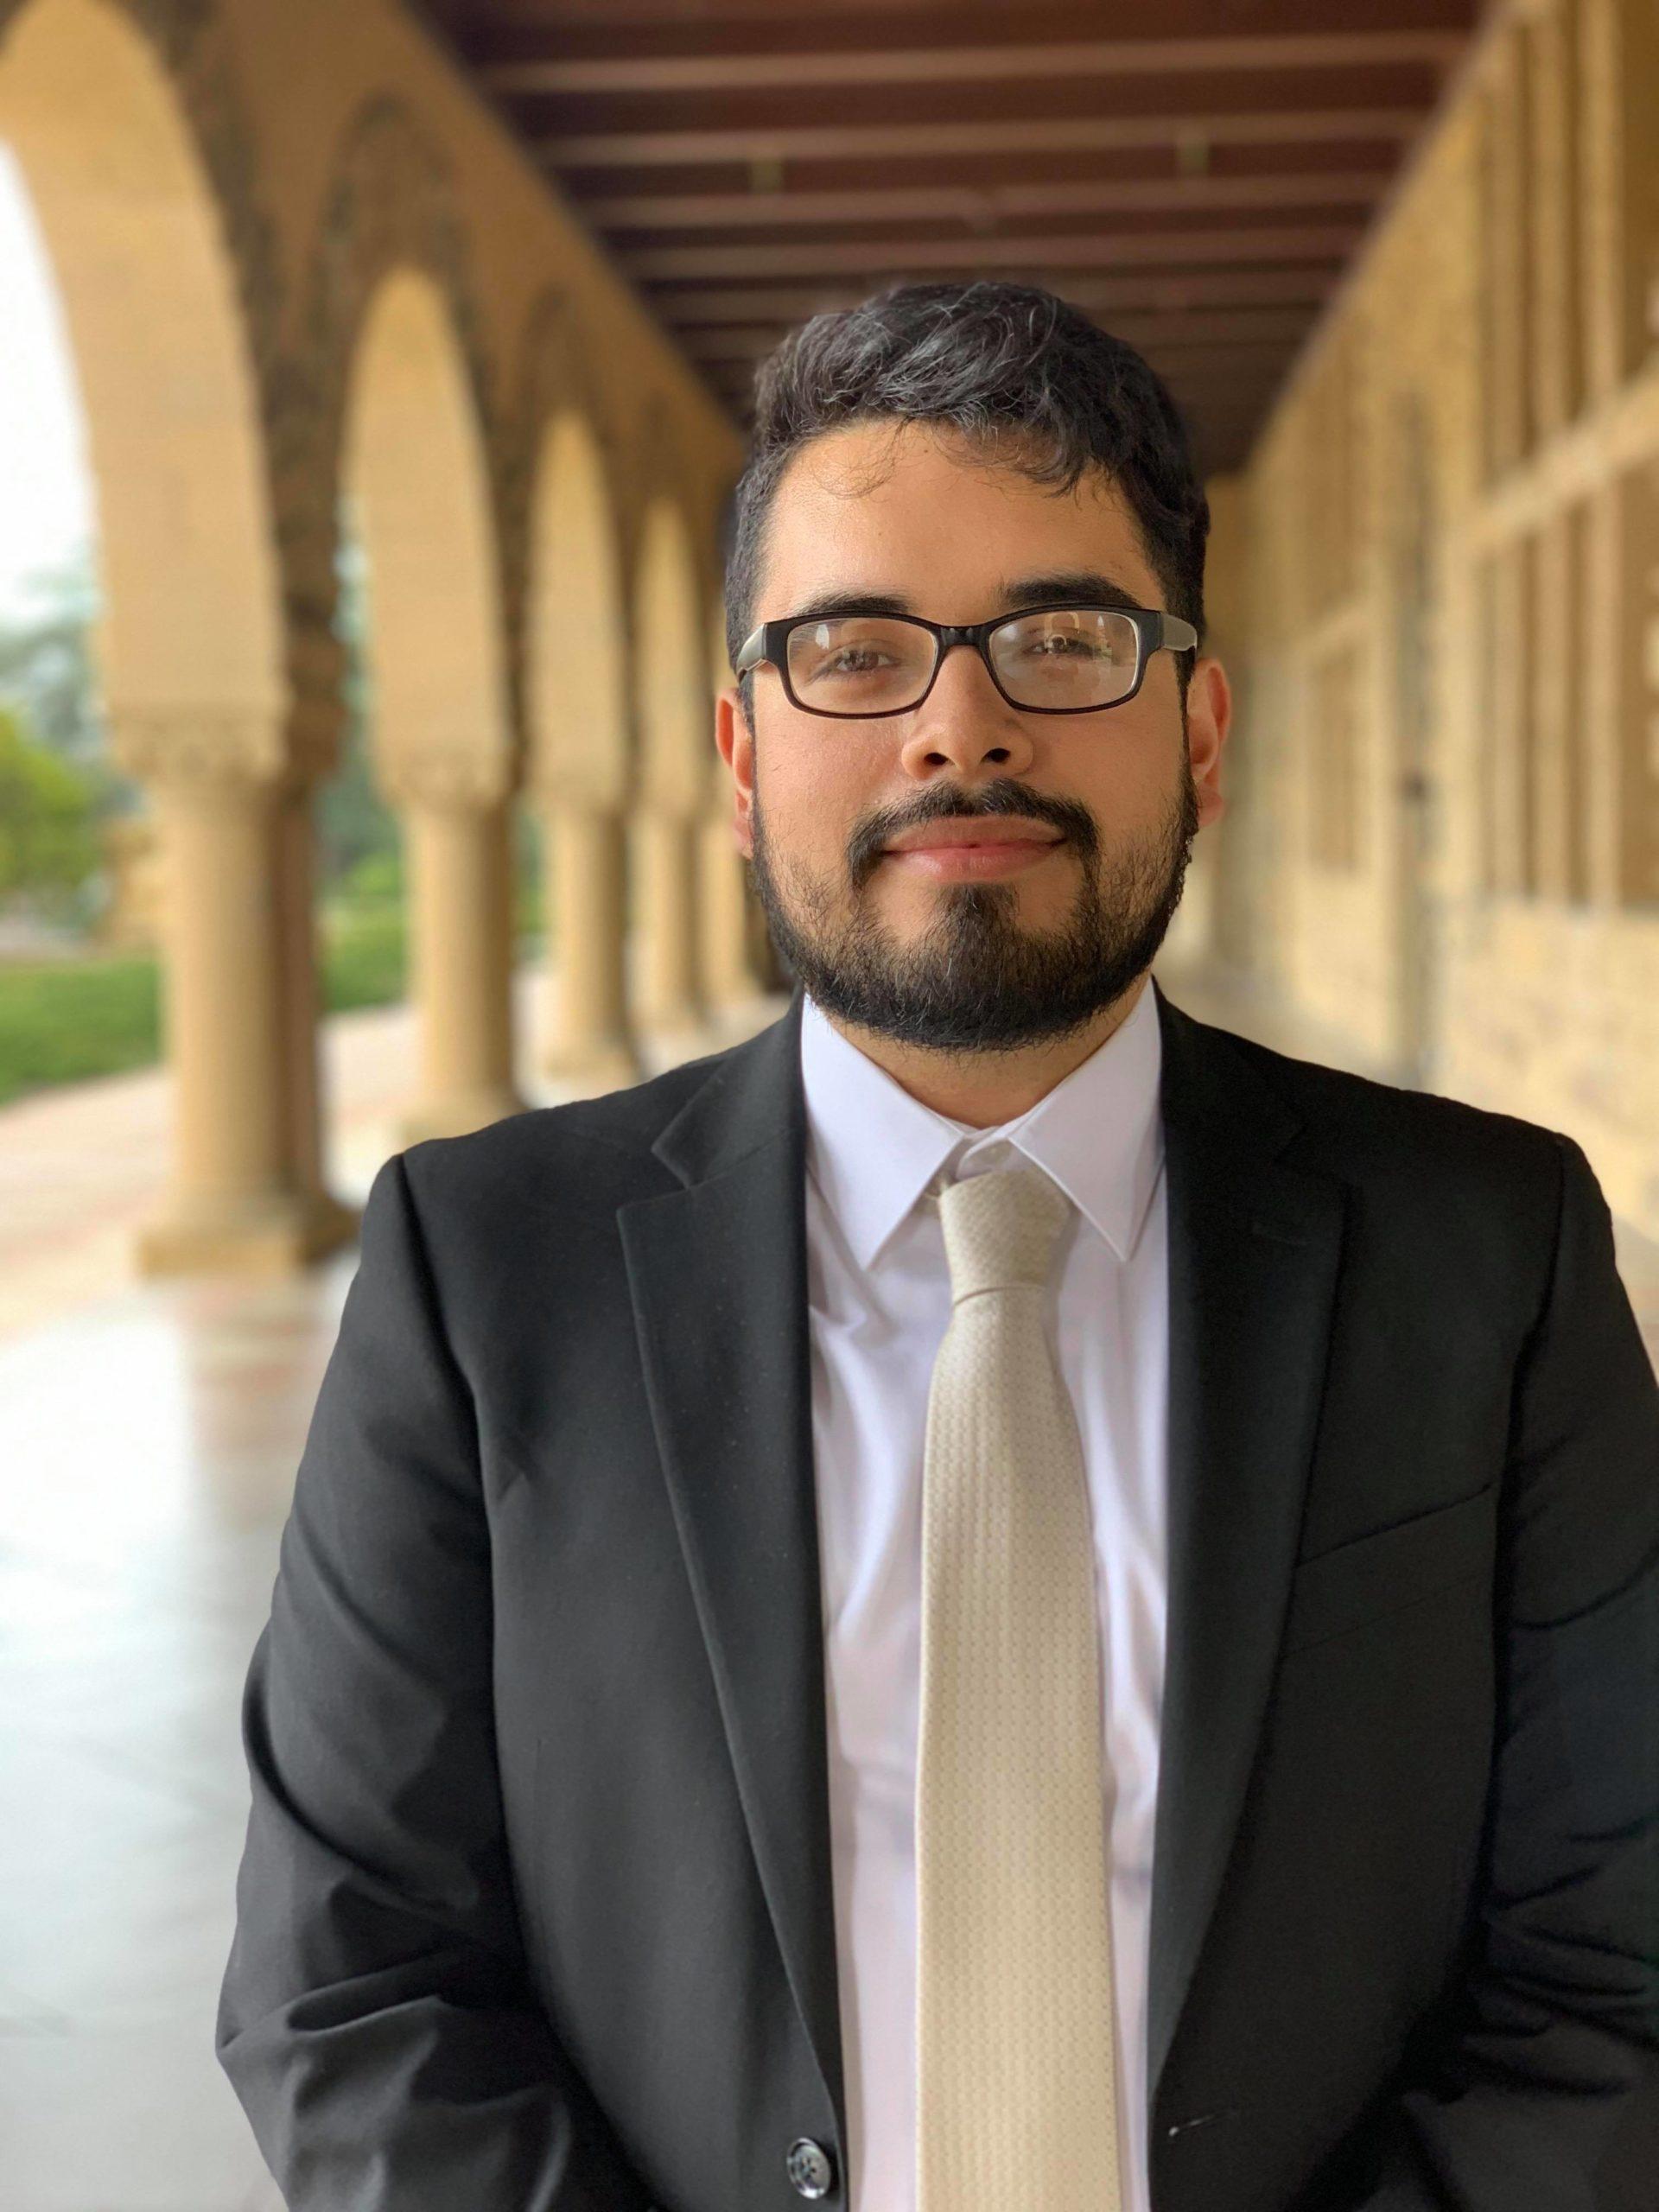 Alejandro Diaz, UW BioE senior